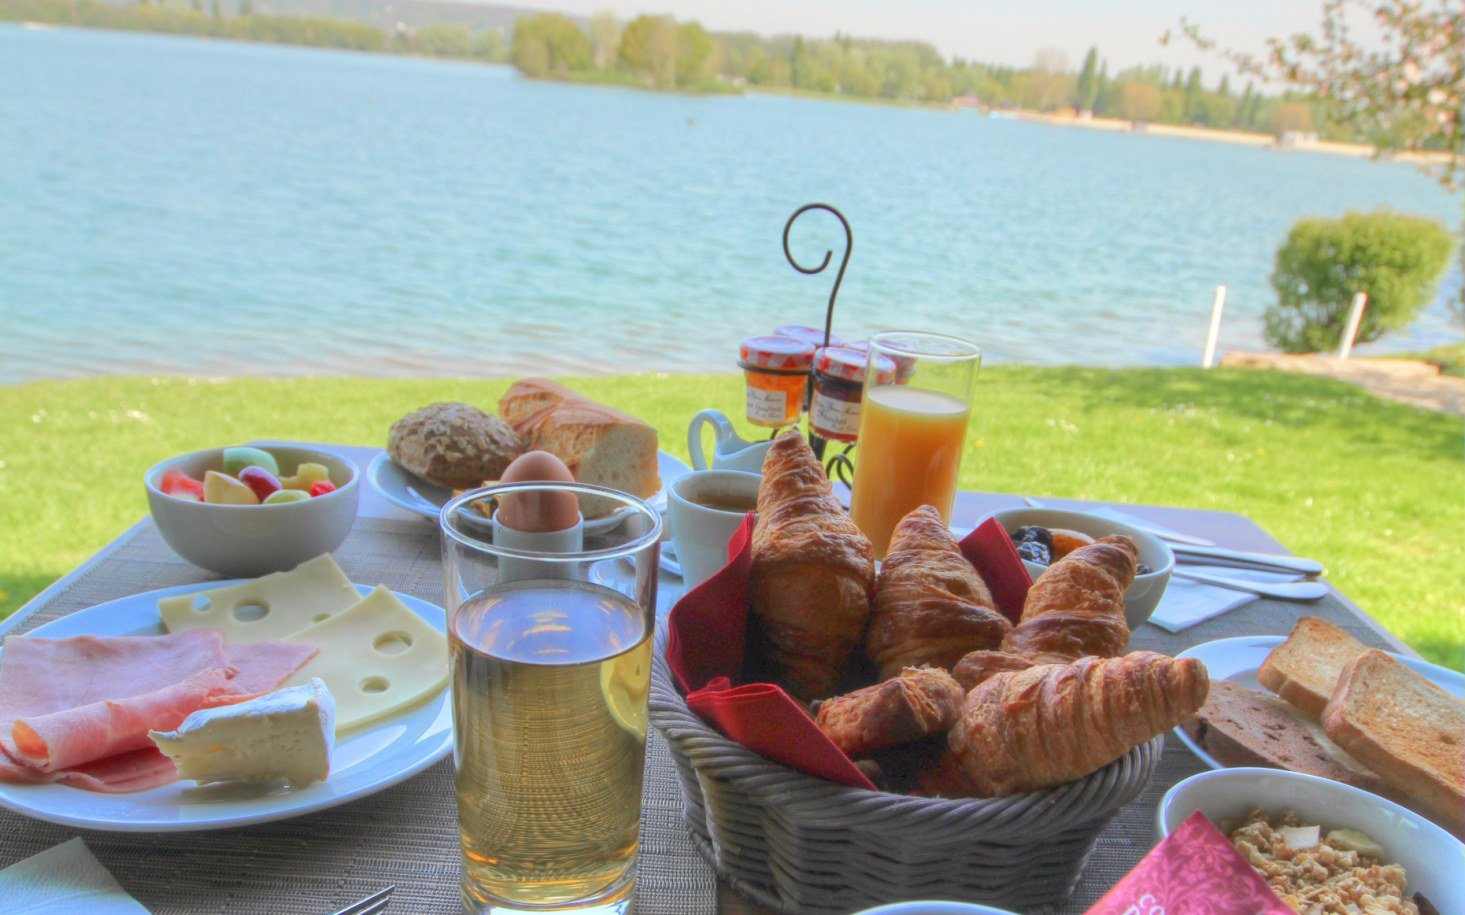 petitdejeuner-edenpark-normandie-lac